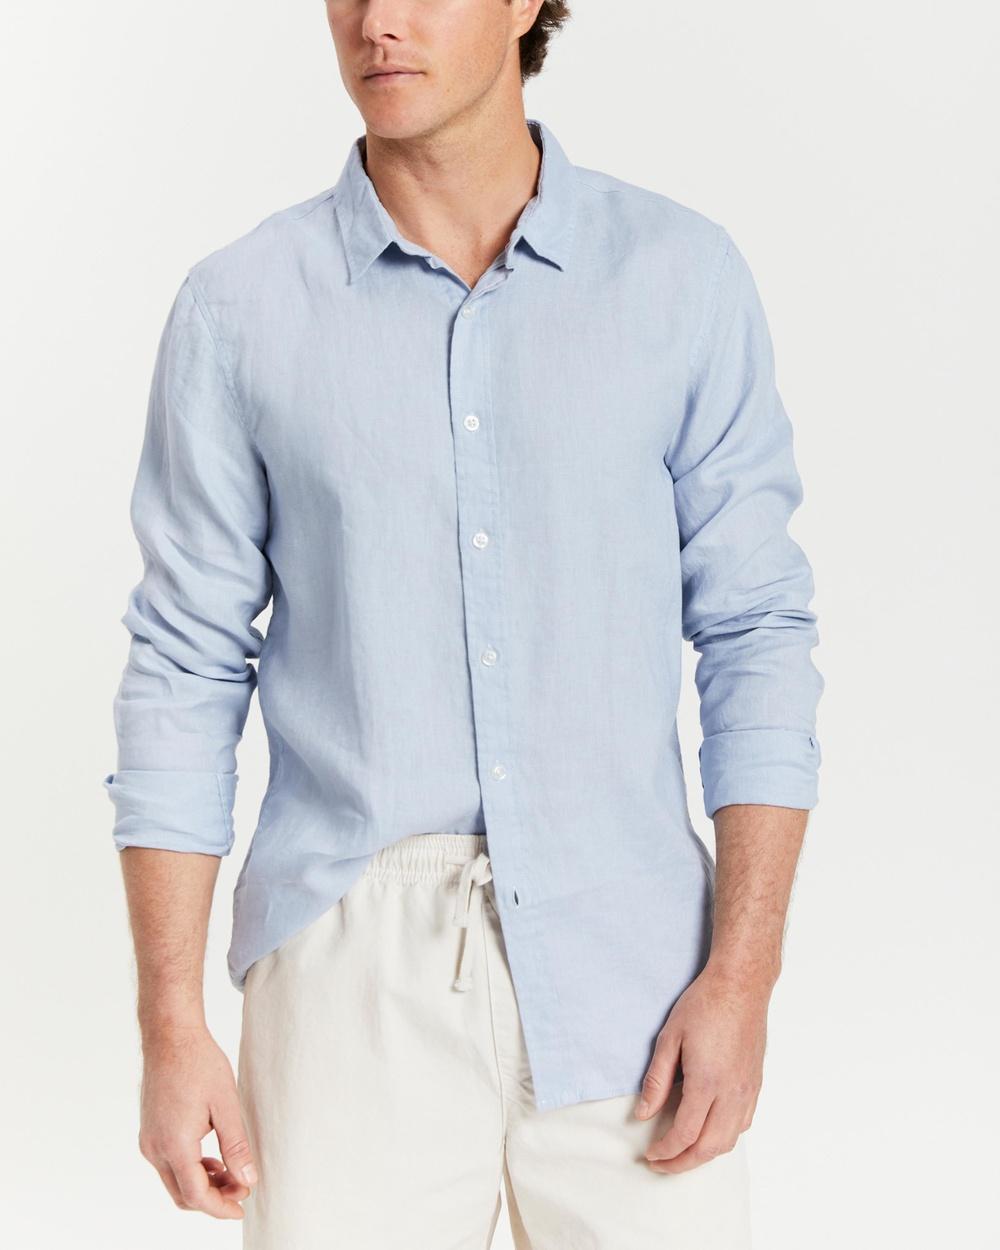 AERE LS Linen Shirt Shirts & Polos Powder Blue